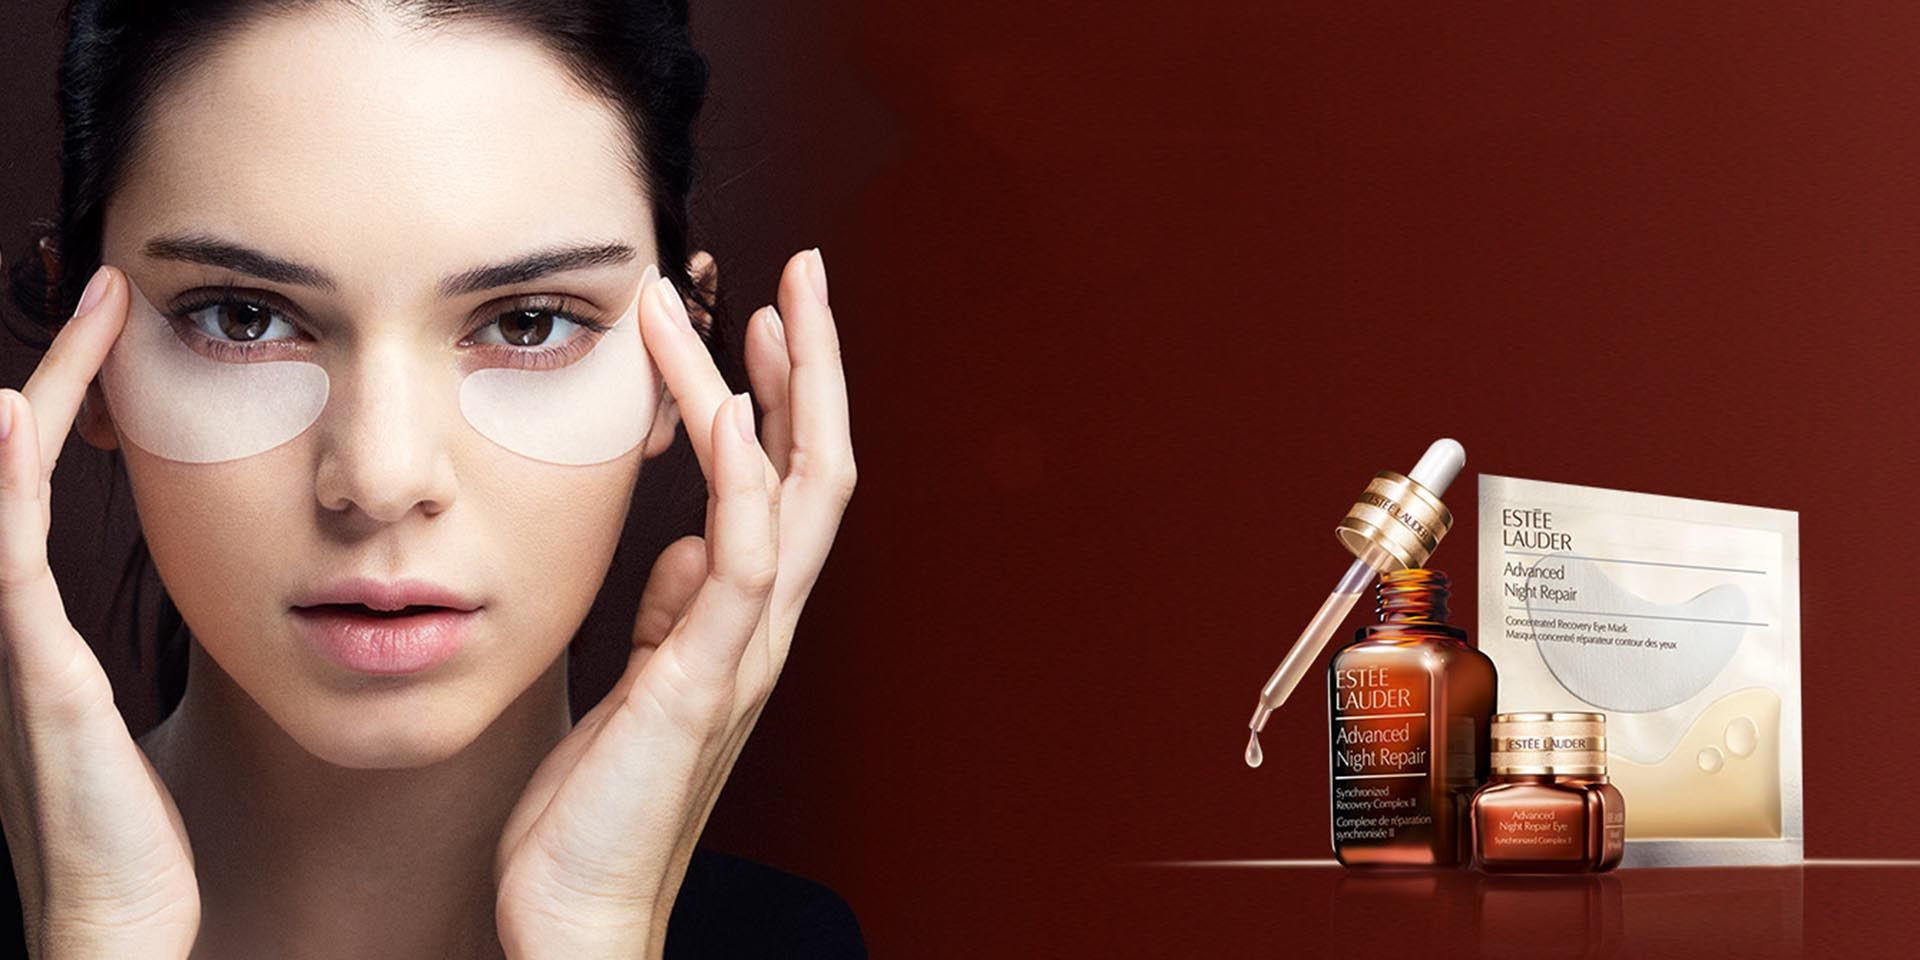 Estée Lauder Beauty Advisors set the standard for